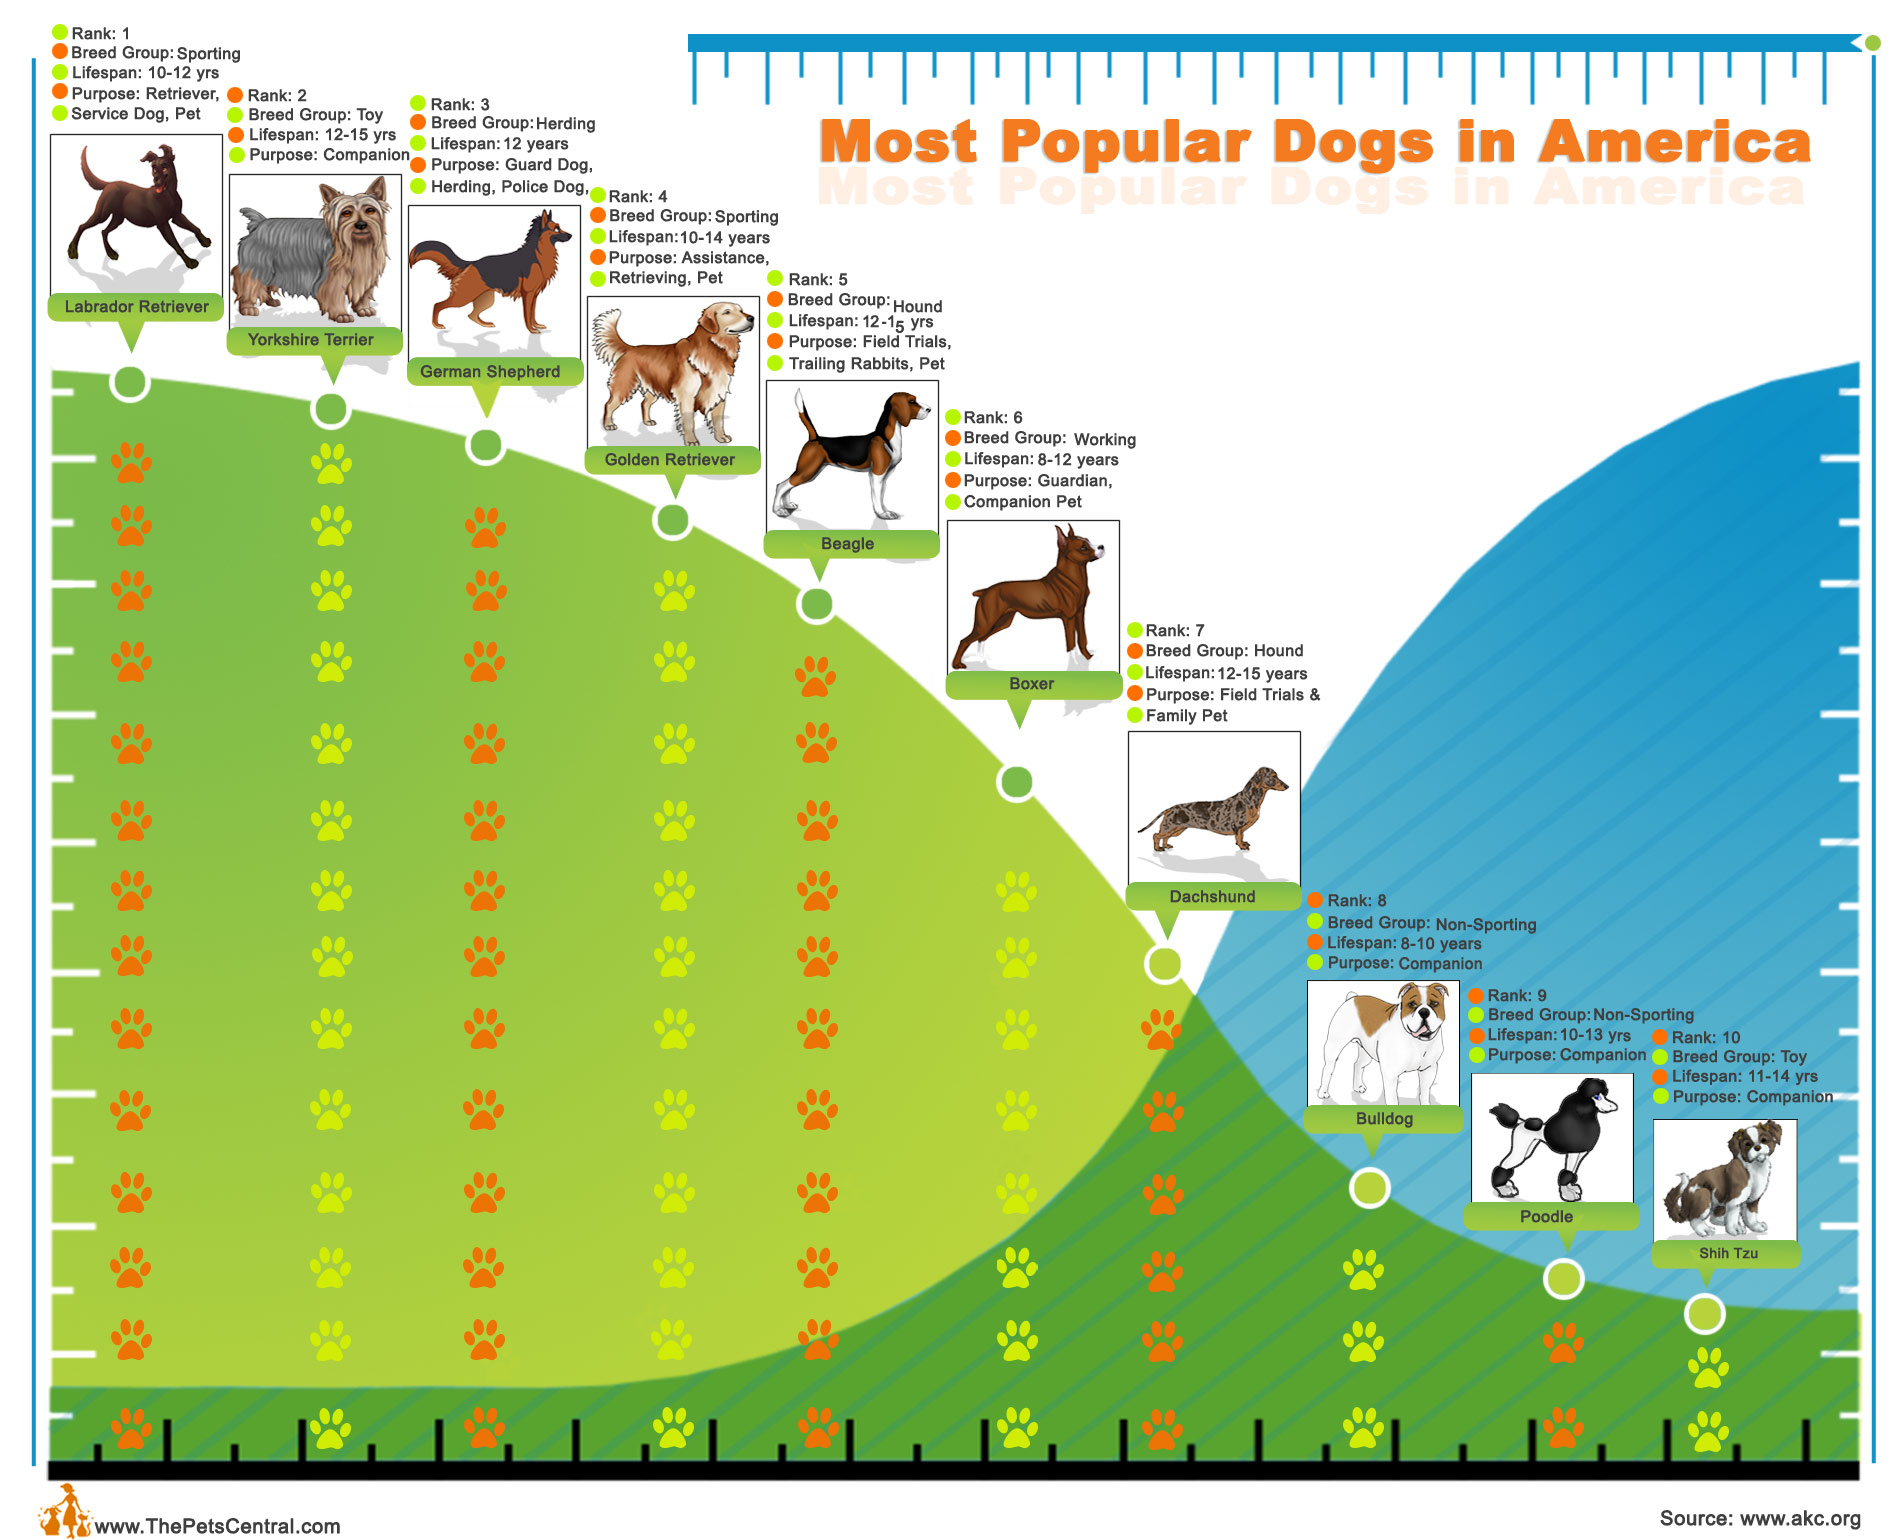 top10-most-popular-dogs-in-america_502917884b7f0.jpg